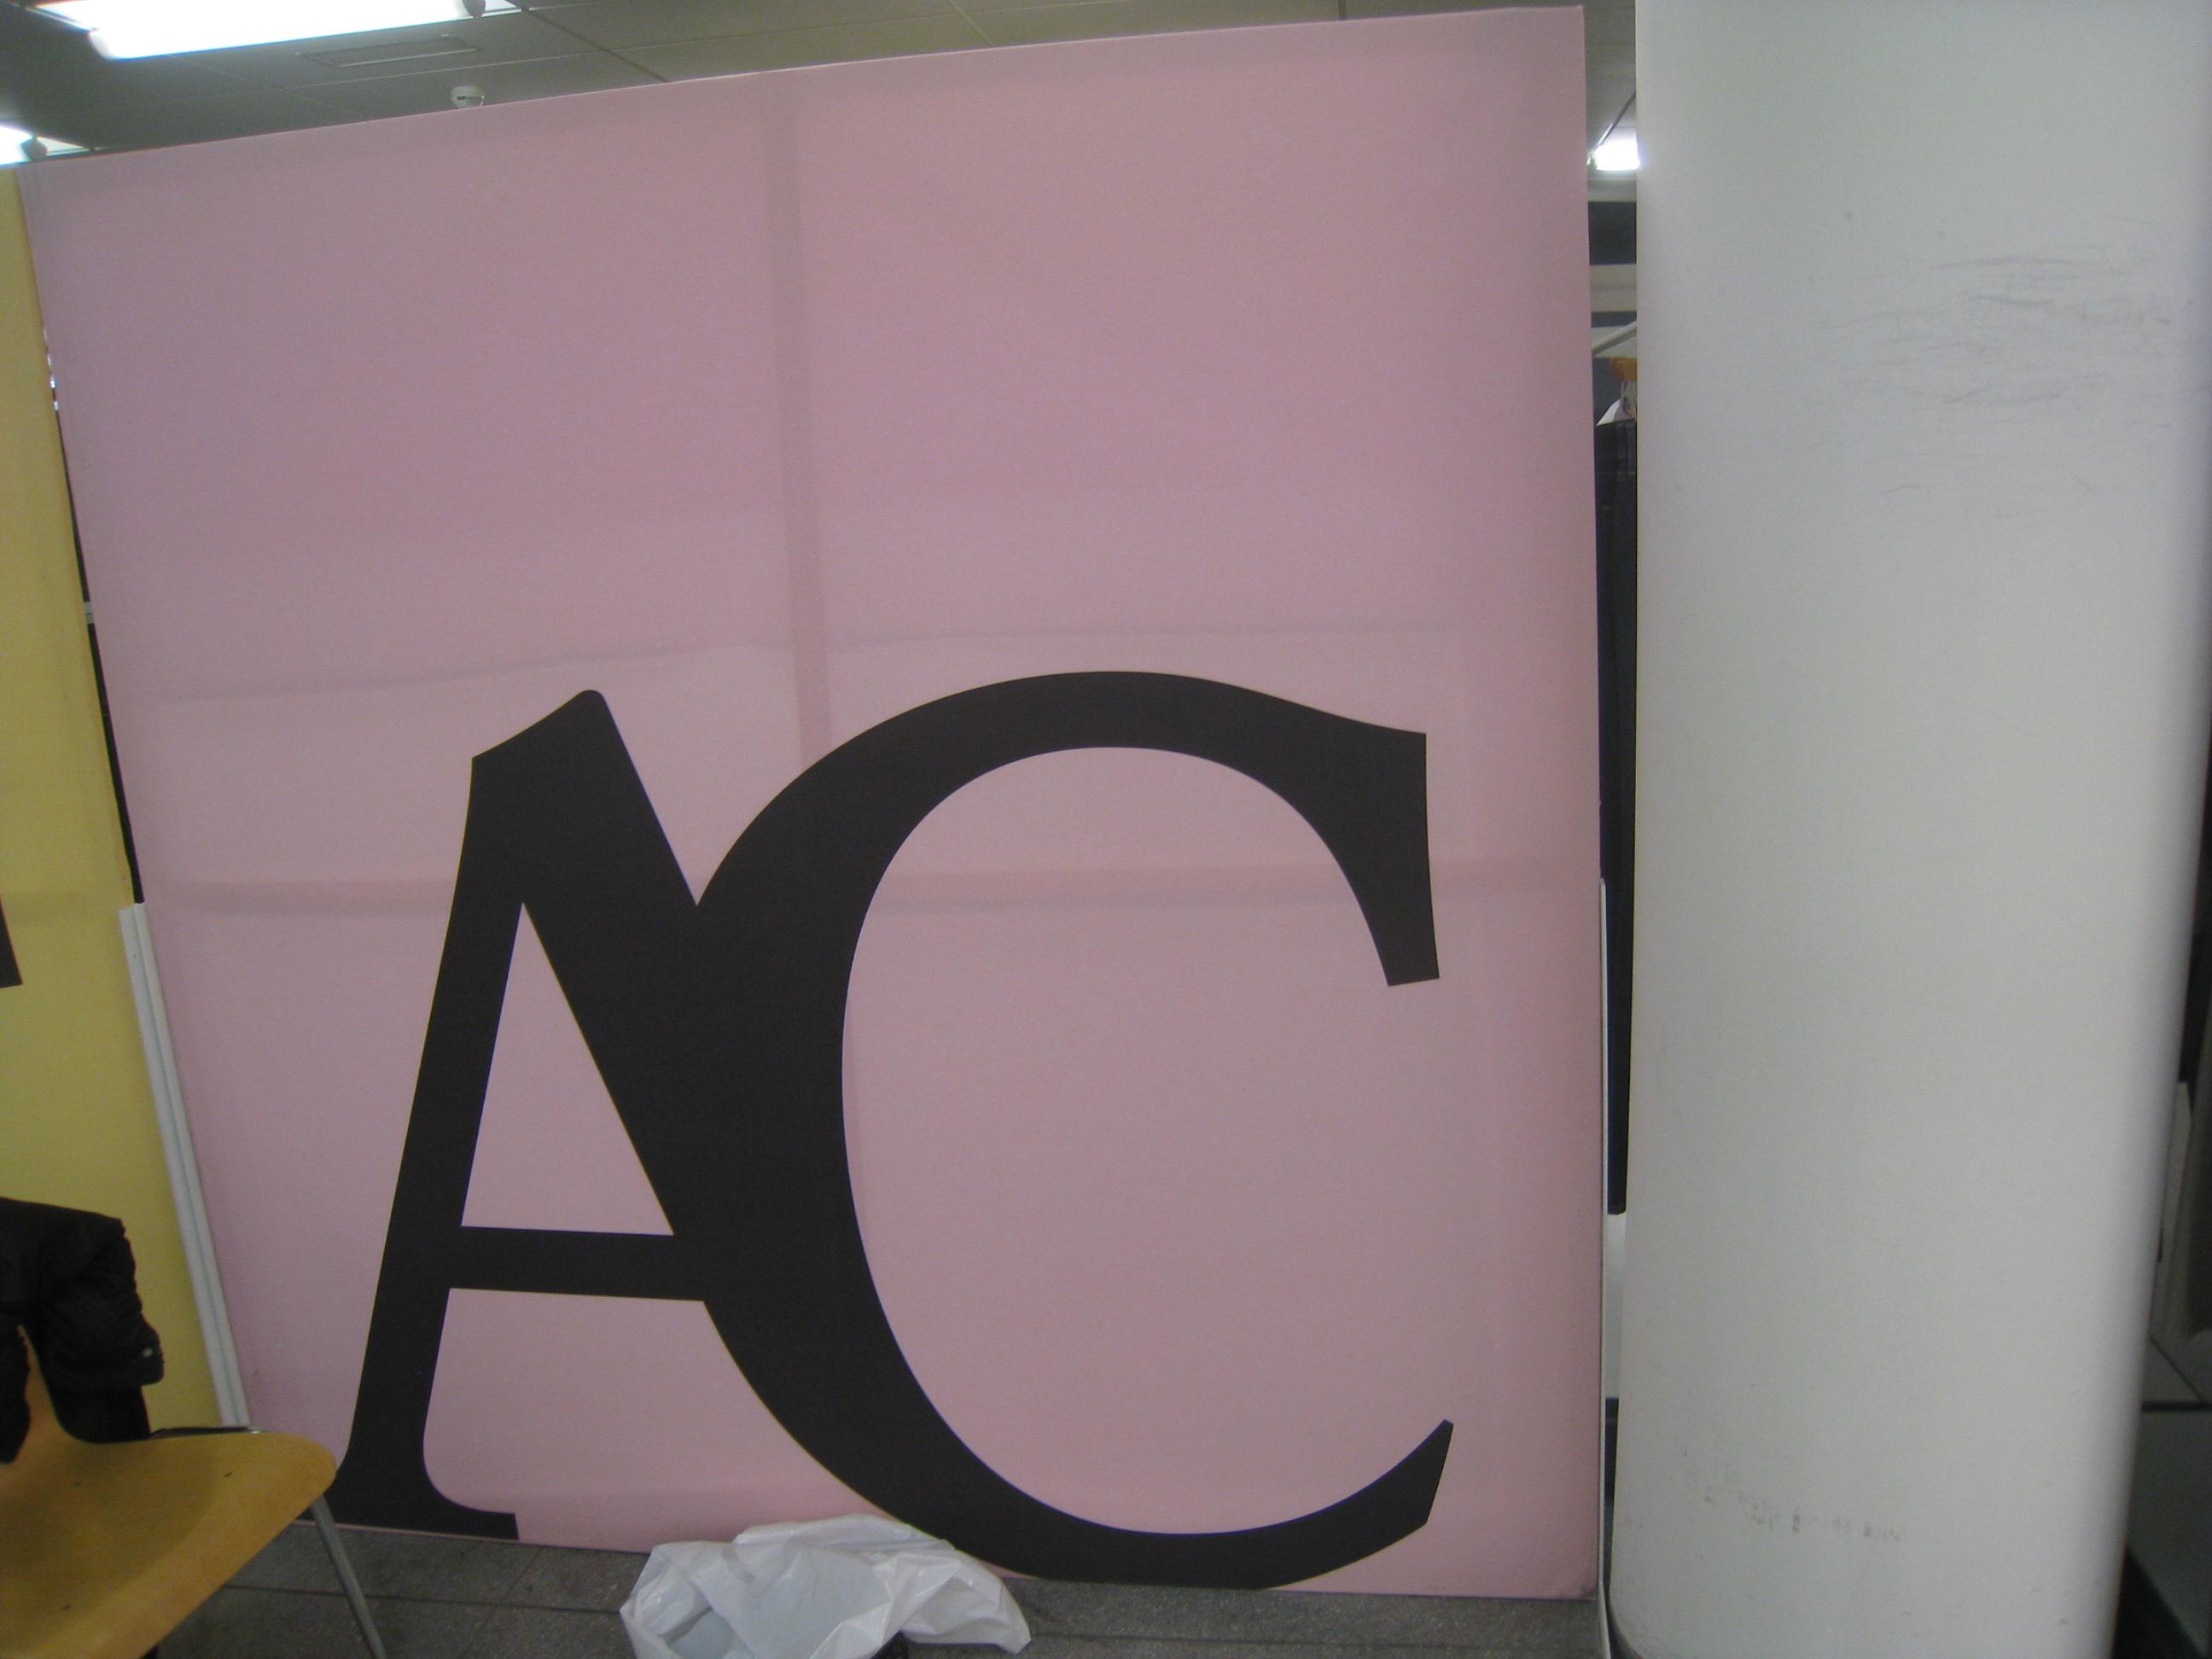 frontrow agency famous face academy make up artist ausbildung. Black Bedroom Furniture Sets. Home Design Ideas